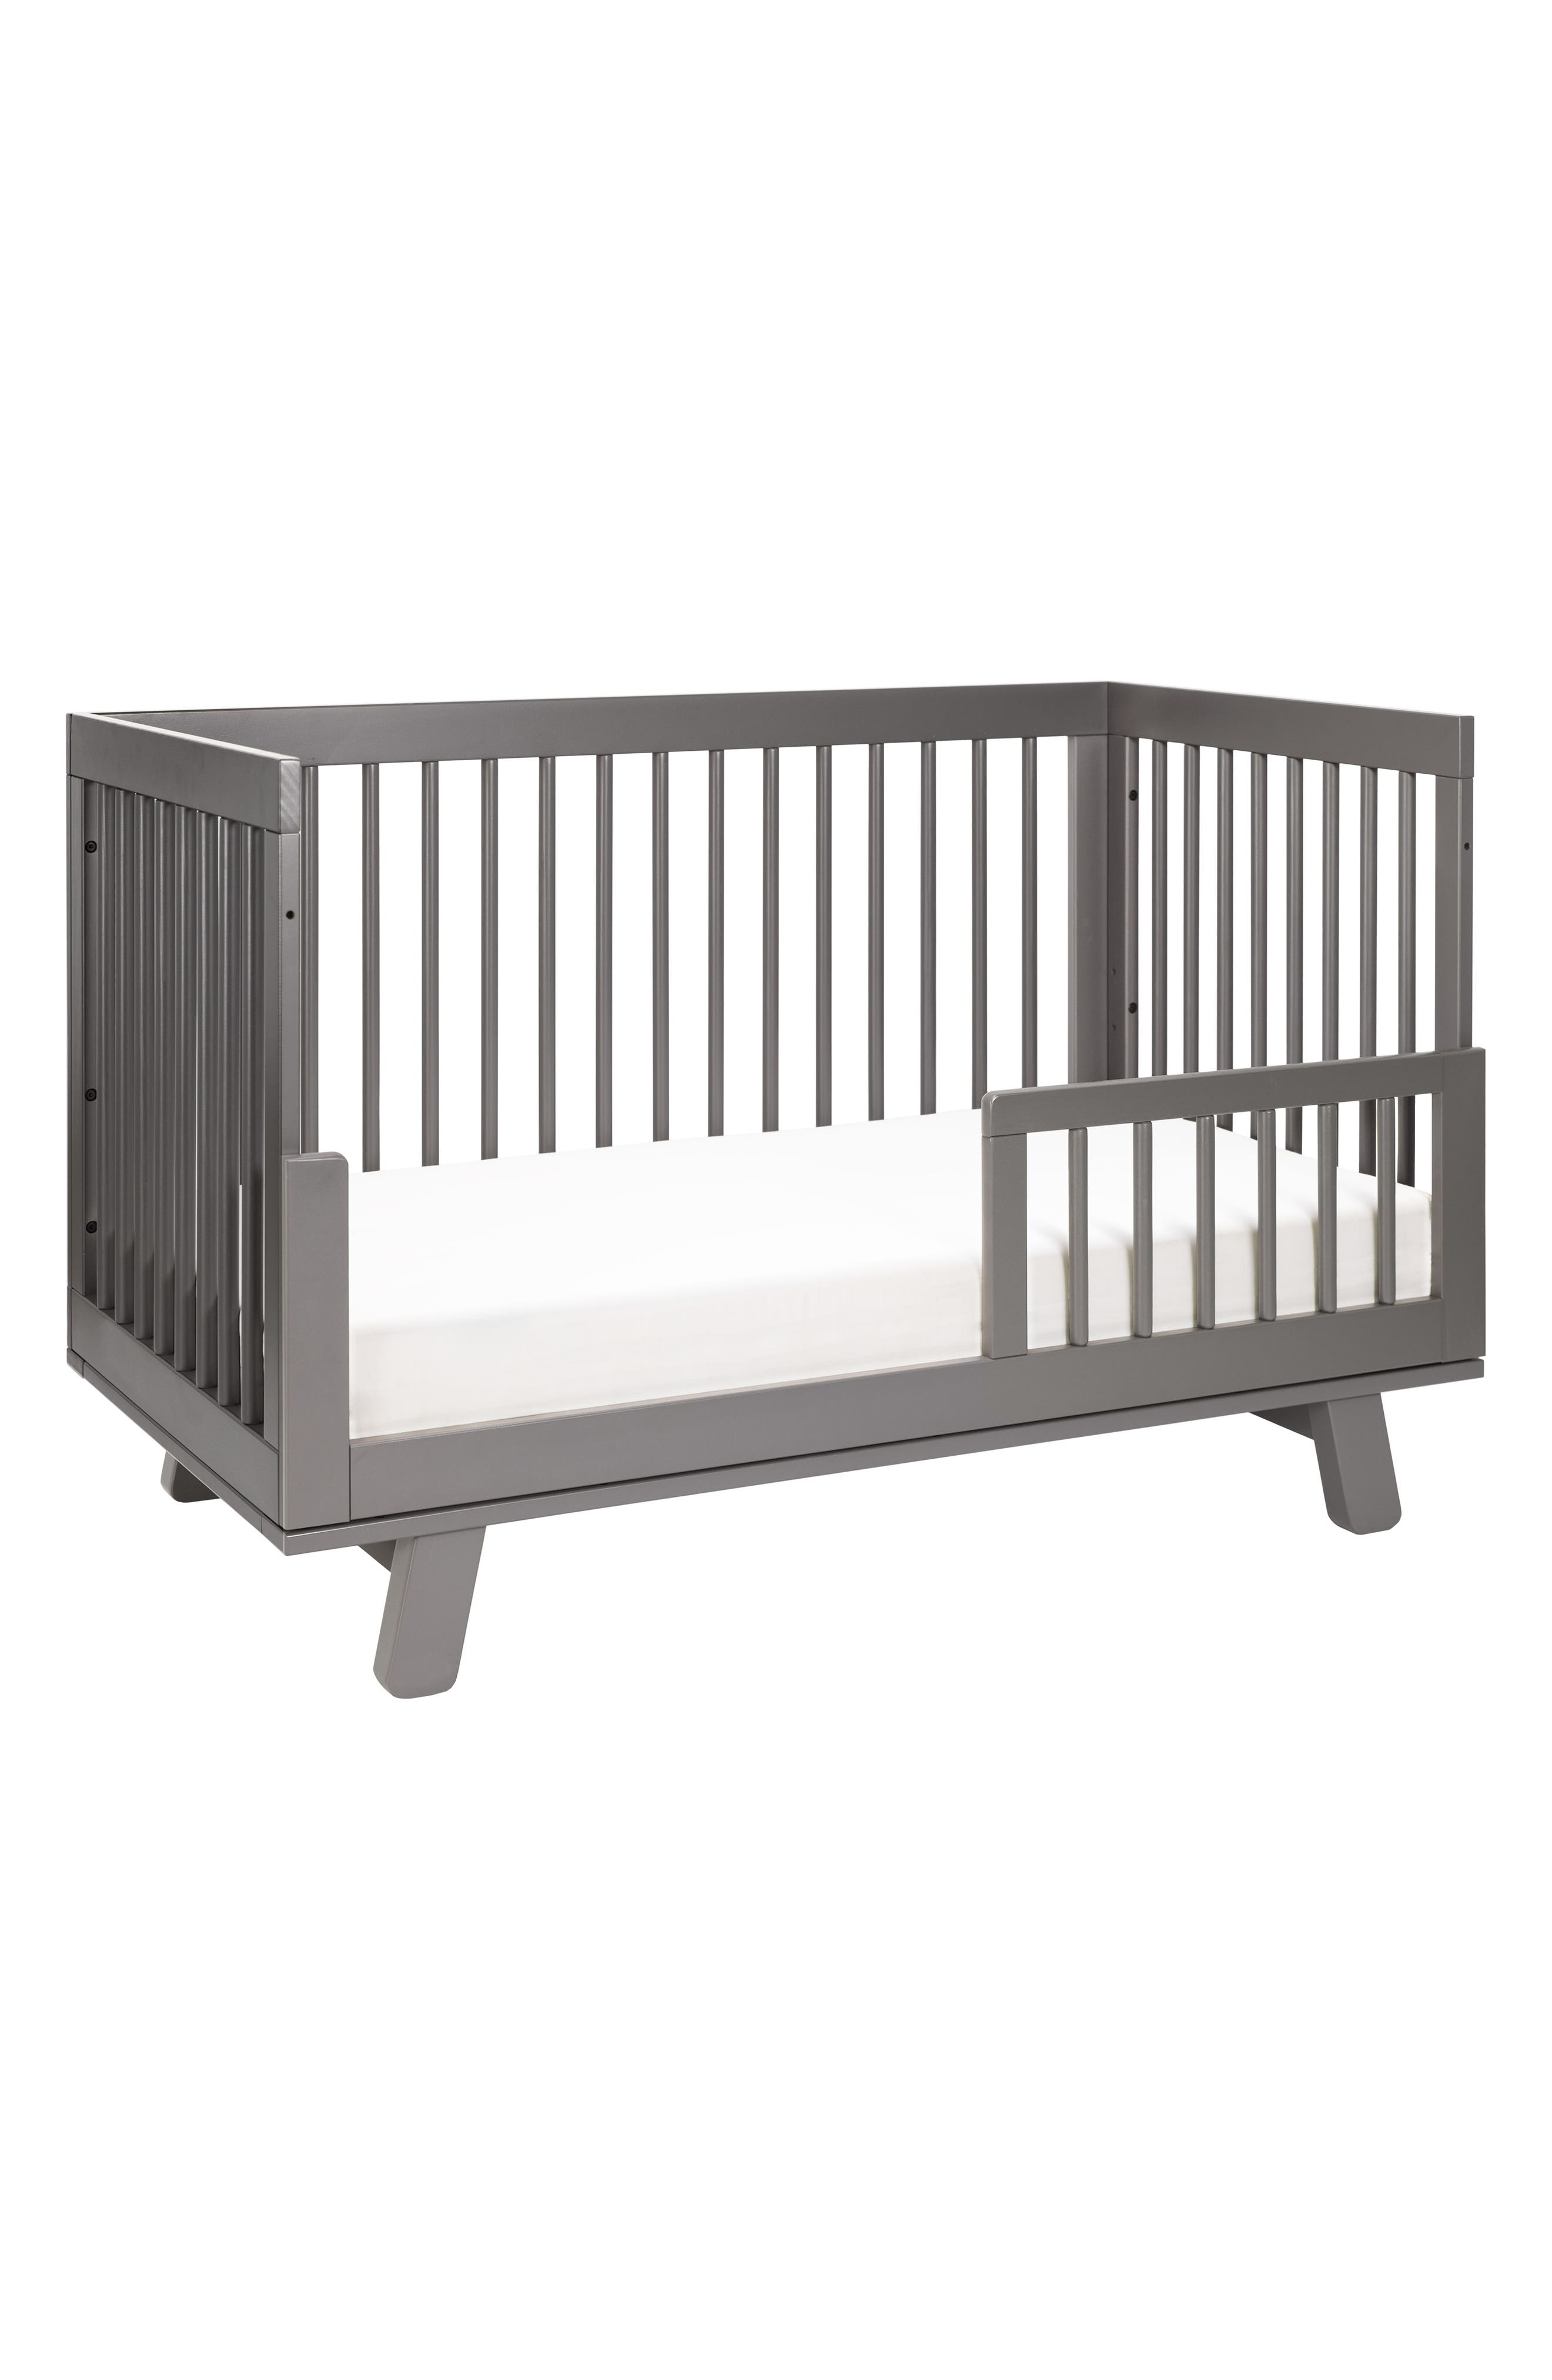 'Hudson' 3-in-1 Convertible Crib,                             Alternate thumbnail 3, color,                             021